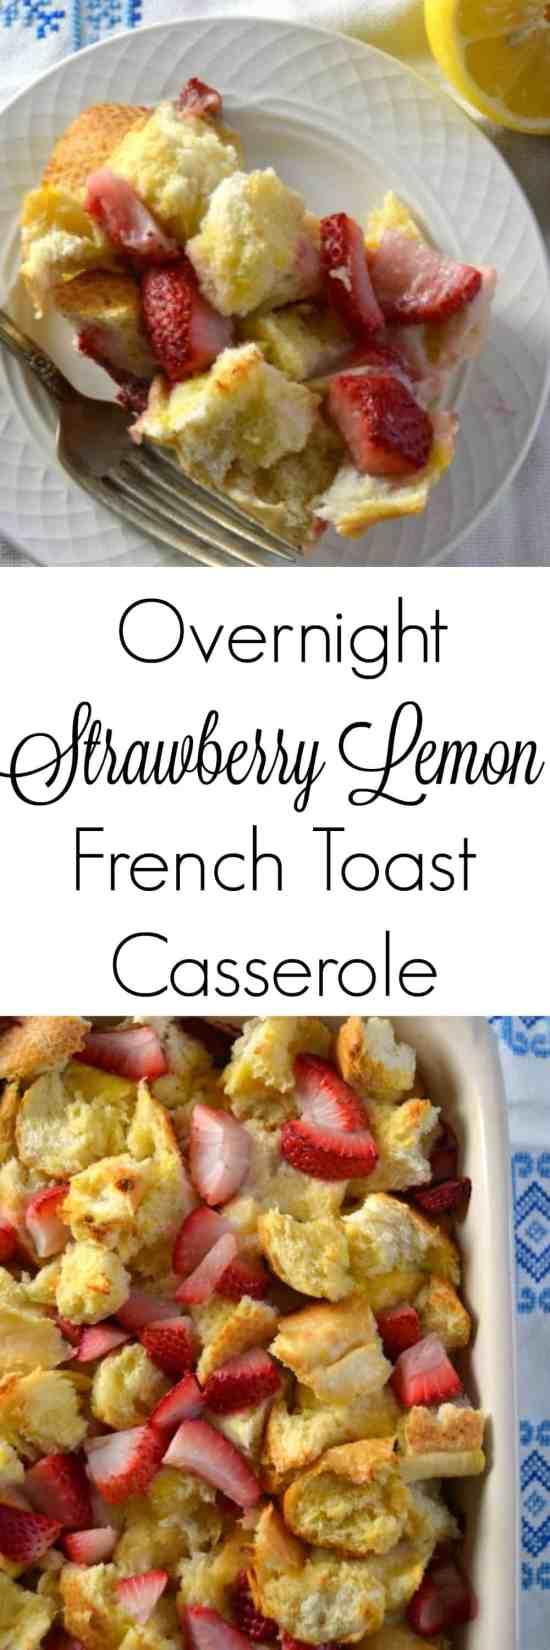 Overnight Strawberry Lemon French Toast Casserole - French Toast Bake - Overnight French Toast Casserole - French Toast Casserole Easy - French Toast Bake - Easter Brunch Recipe